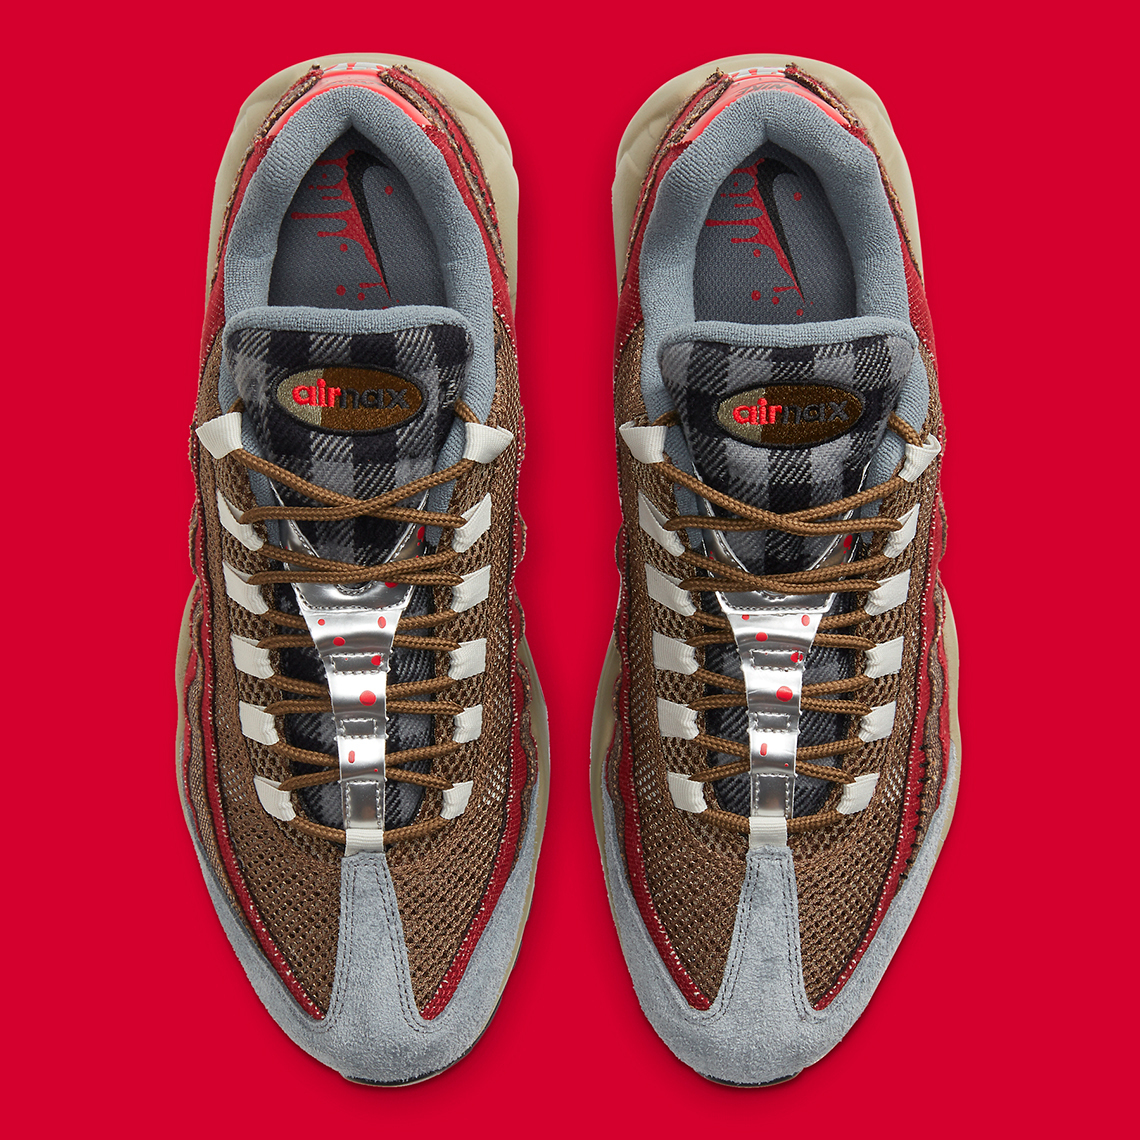 Nike Air Max 95 ''Freddy Krueger'' - DC9215-200